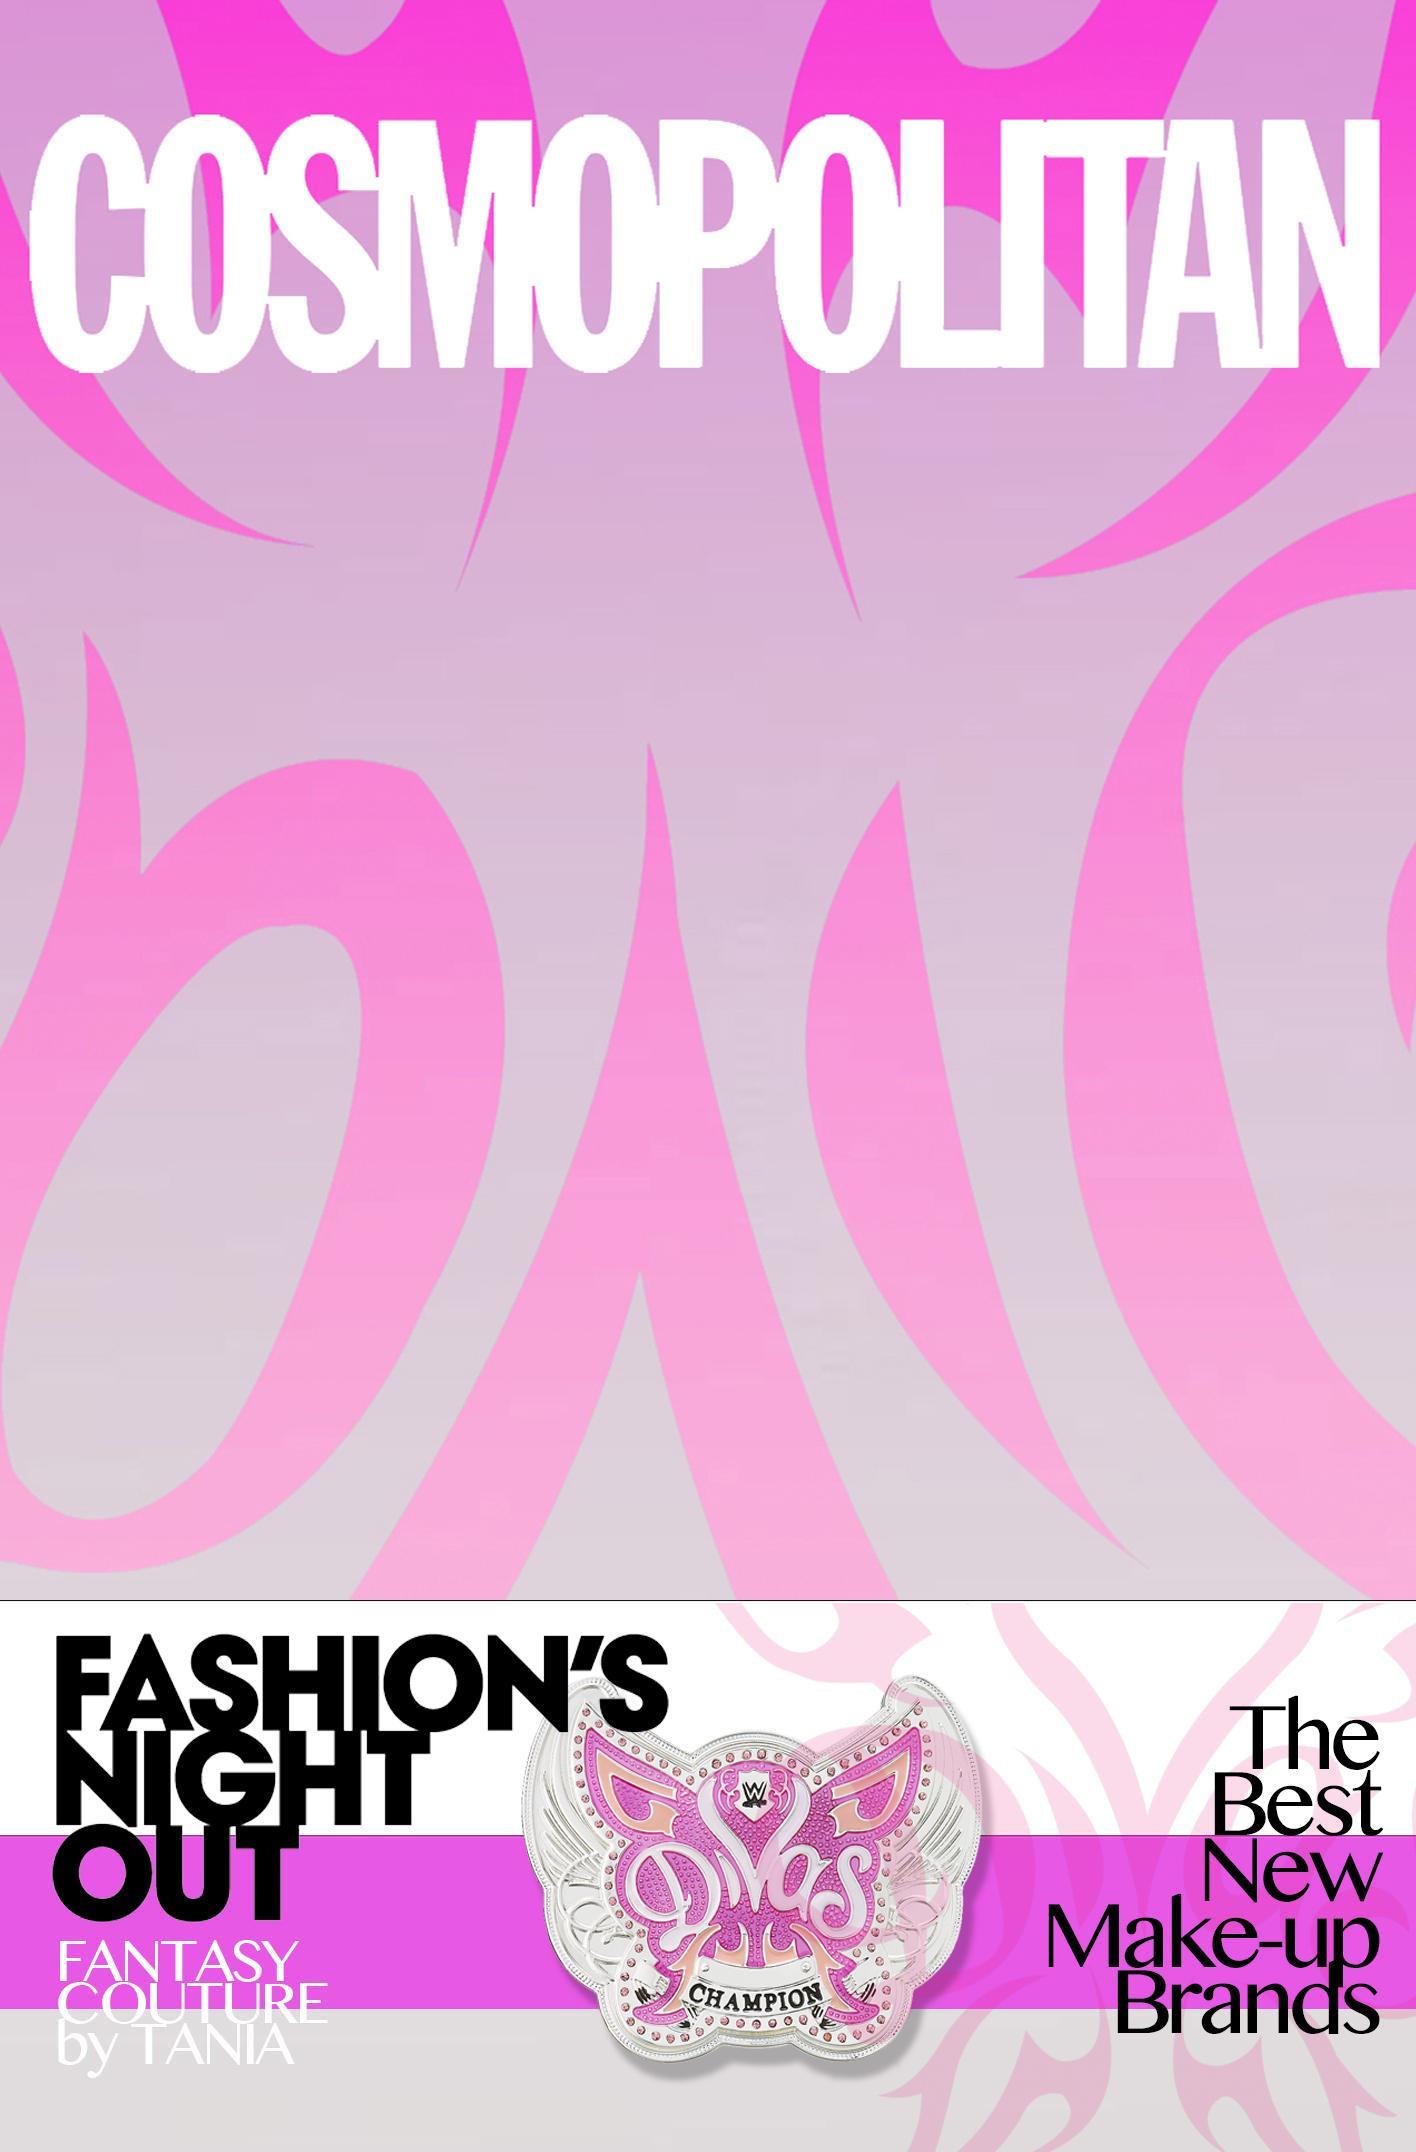 Magazine - Cosmopolitan